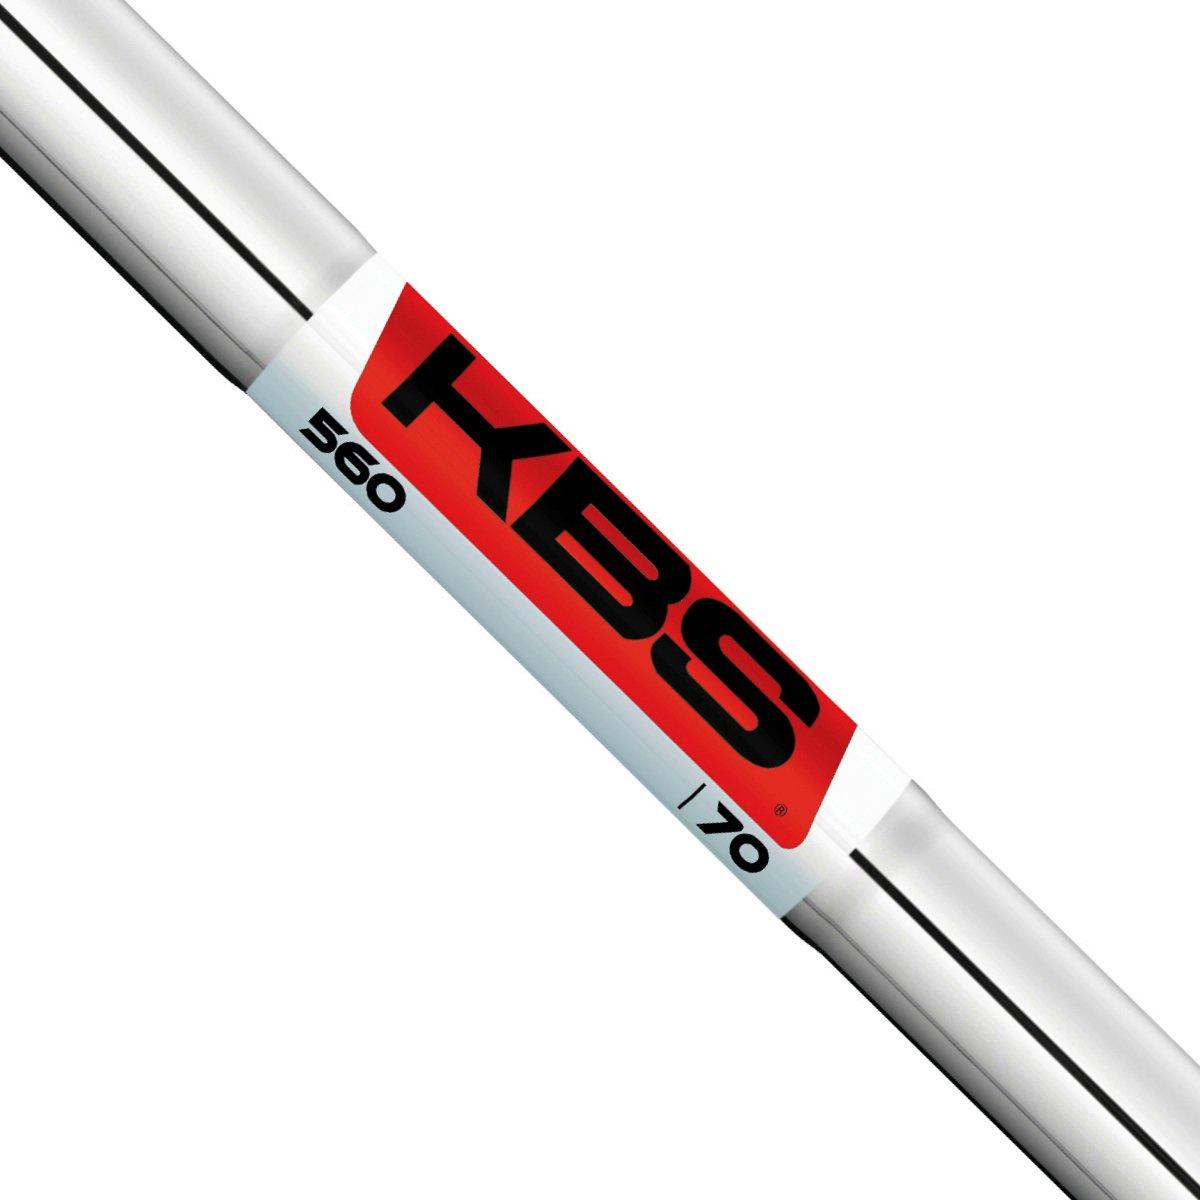 KBS 560シリーズIronシャフト – .355テーパ先端 – 7シャフトセット4-pw – Regular Flex B0759Q748R